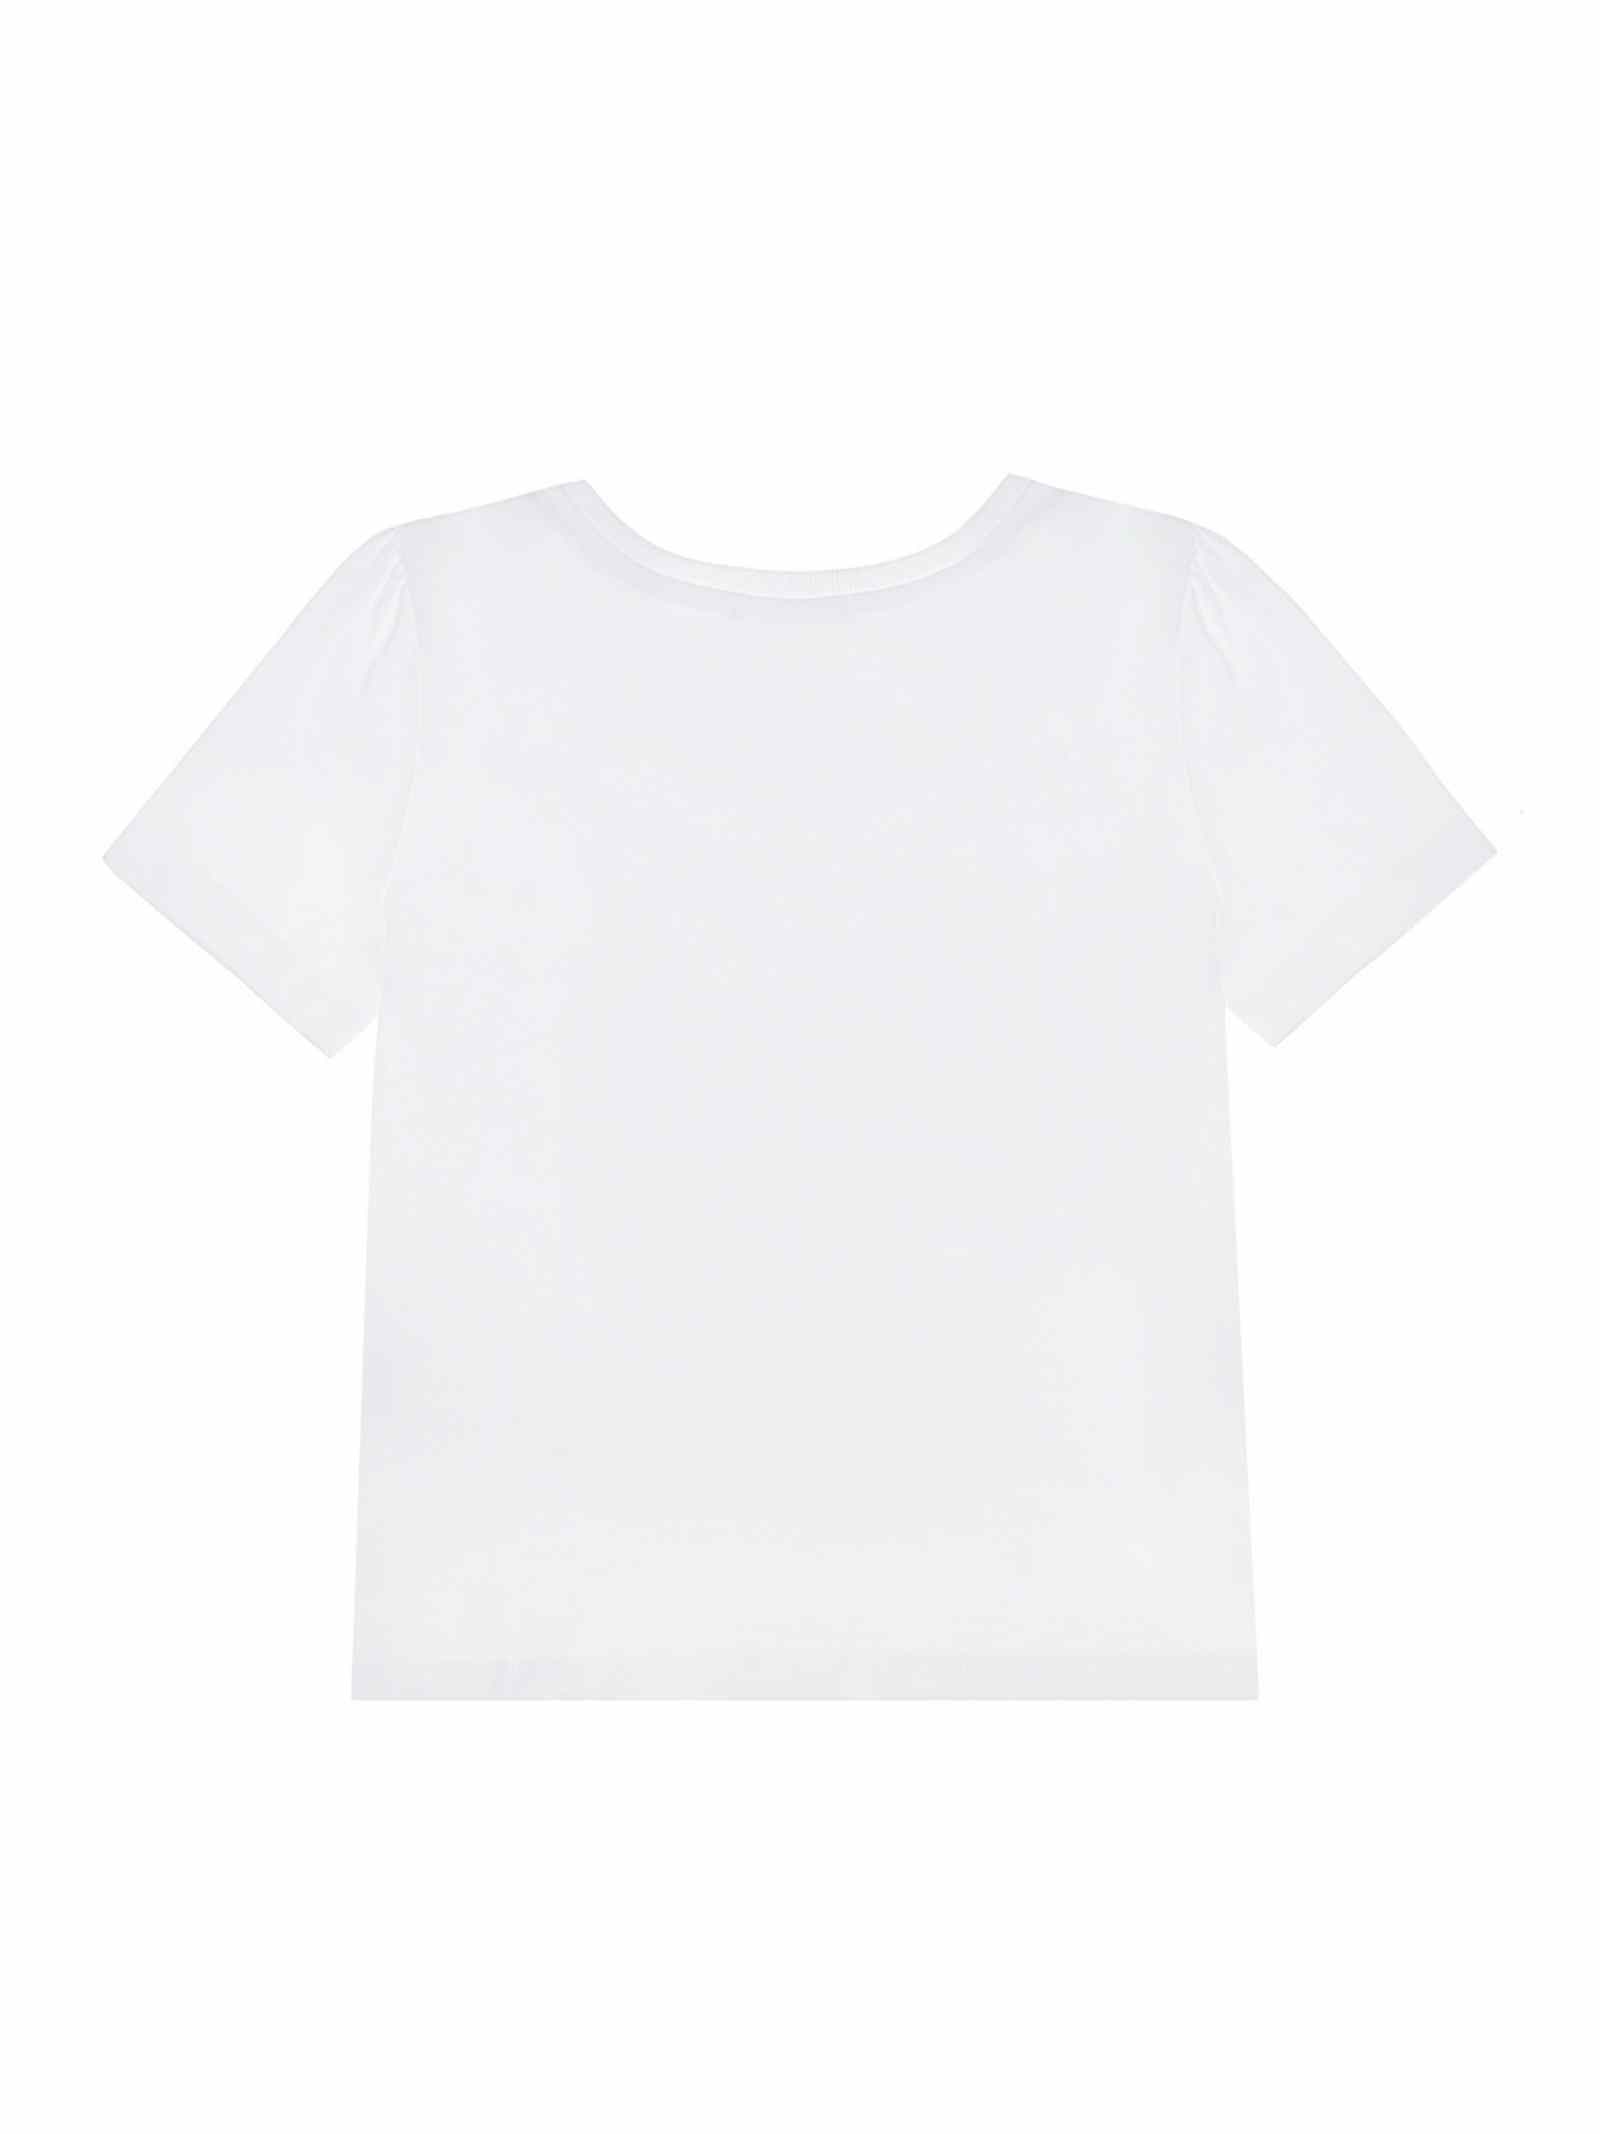 DIESEL | T-shirt | K00059 00YI9K100